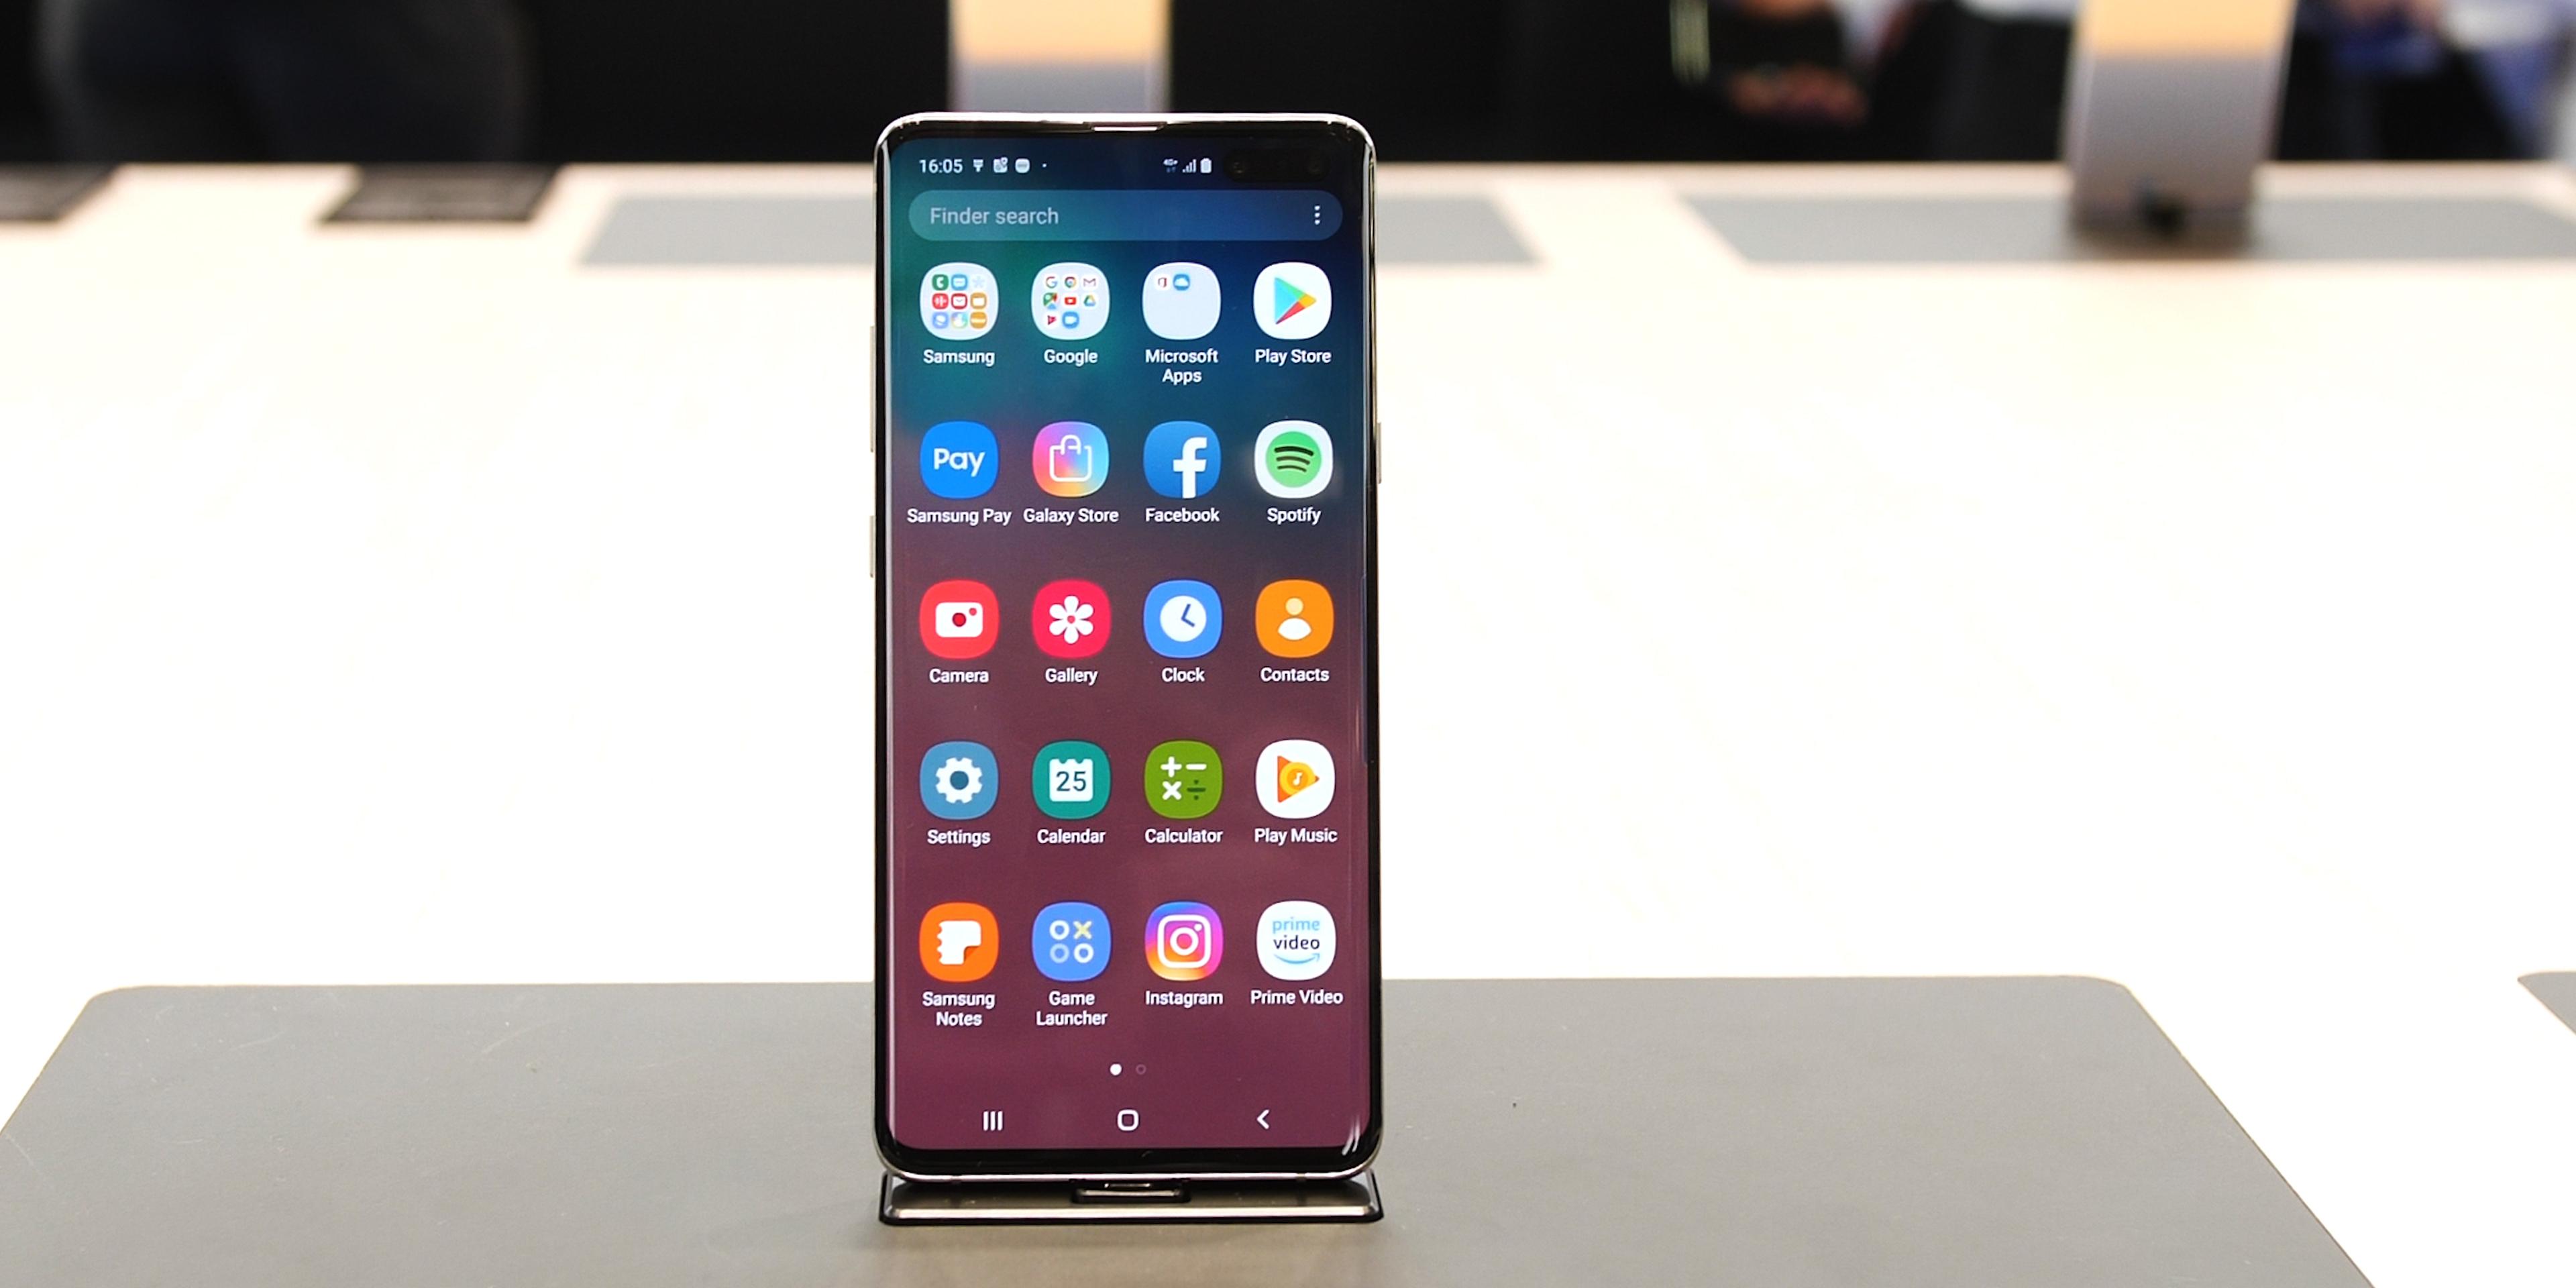 Samsung Galaxy S10 5G hardware and design